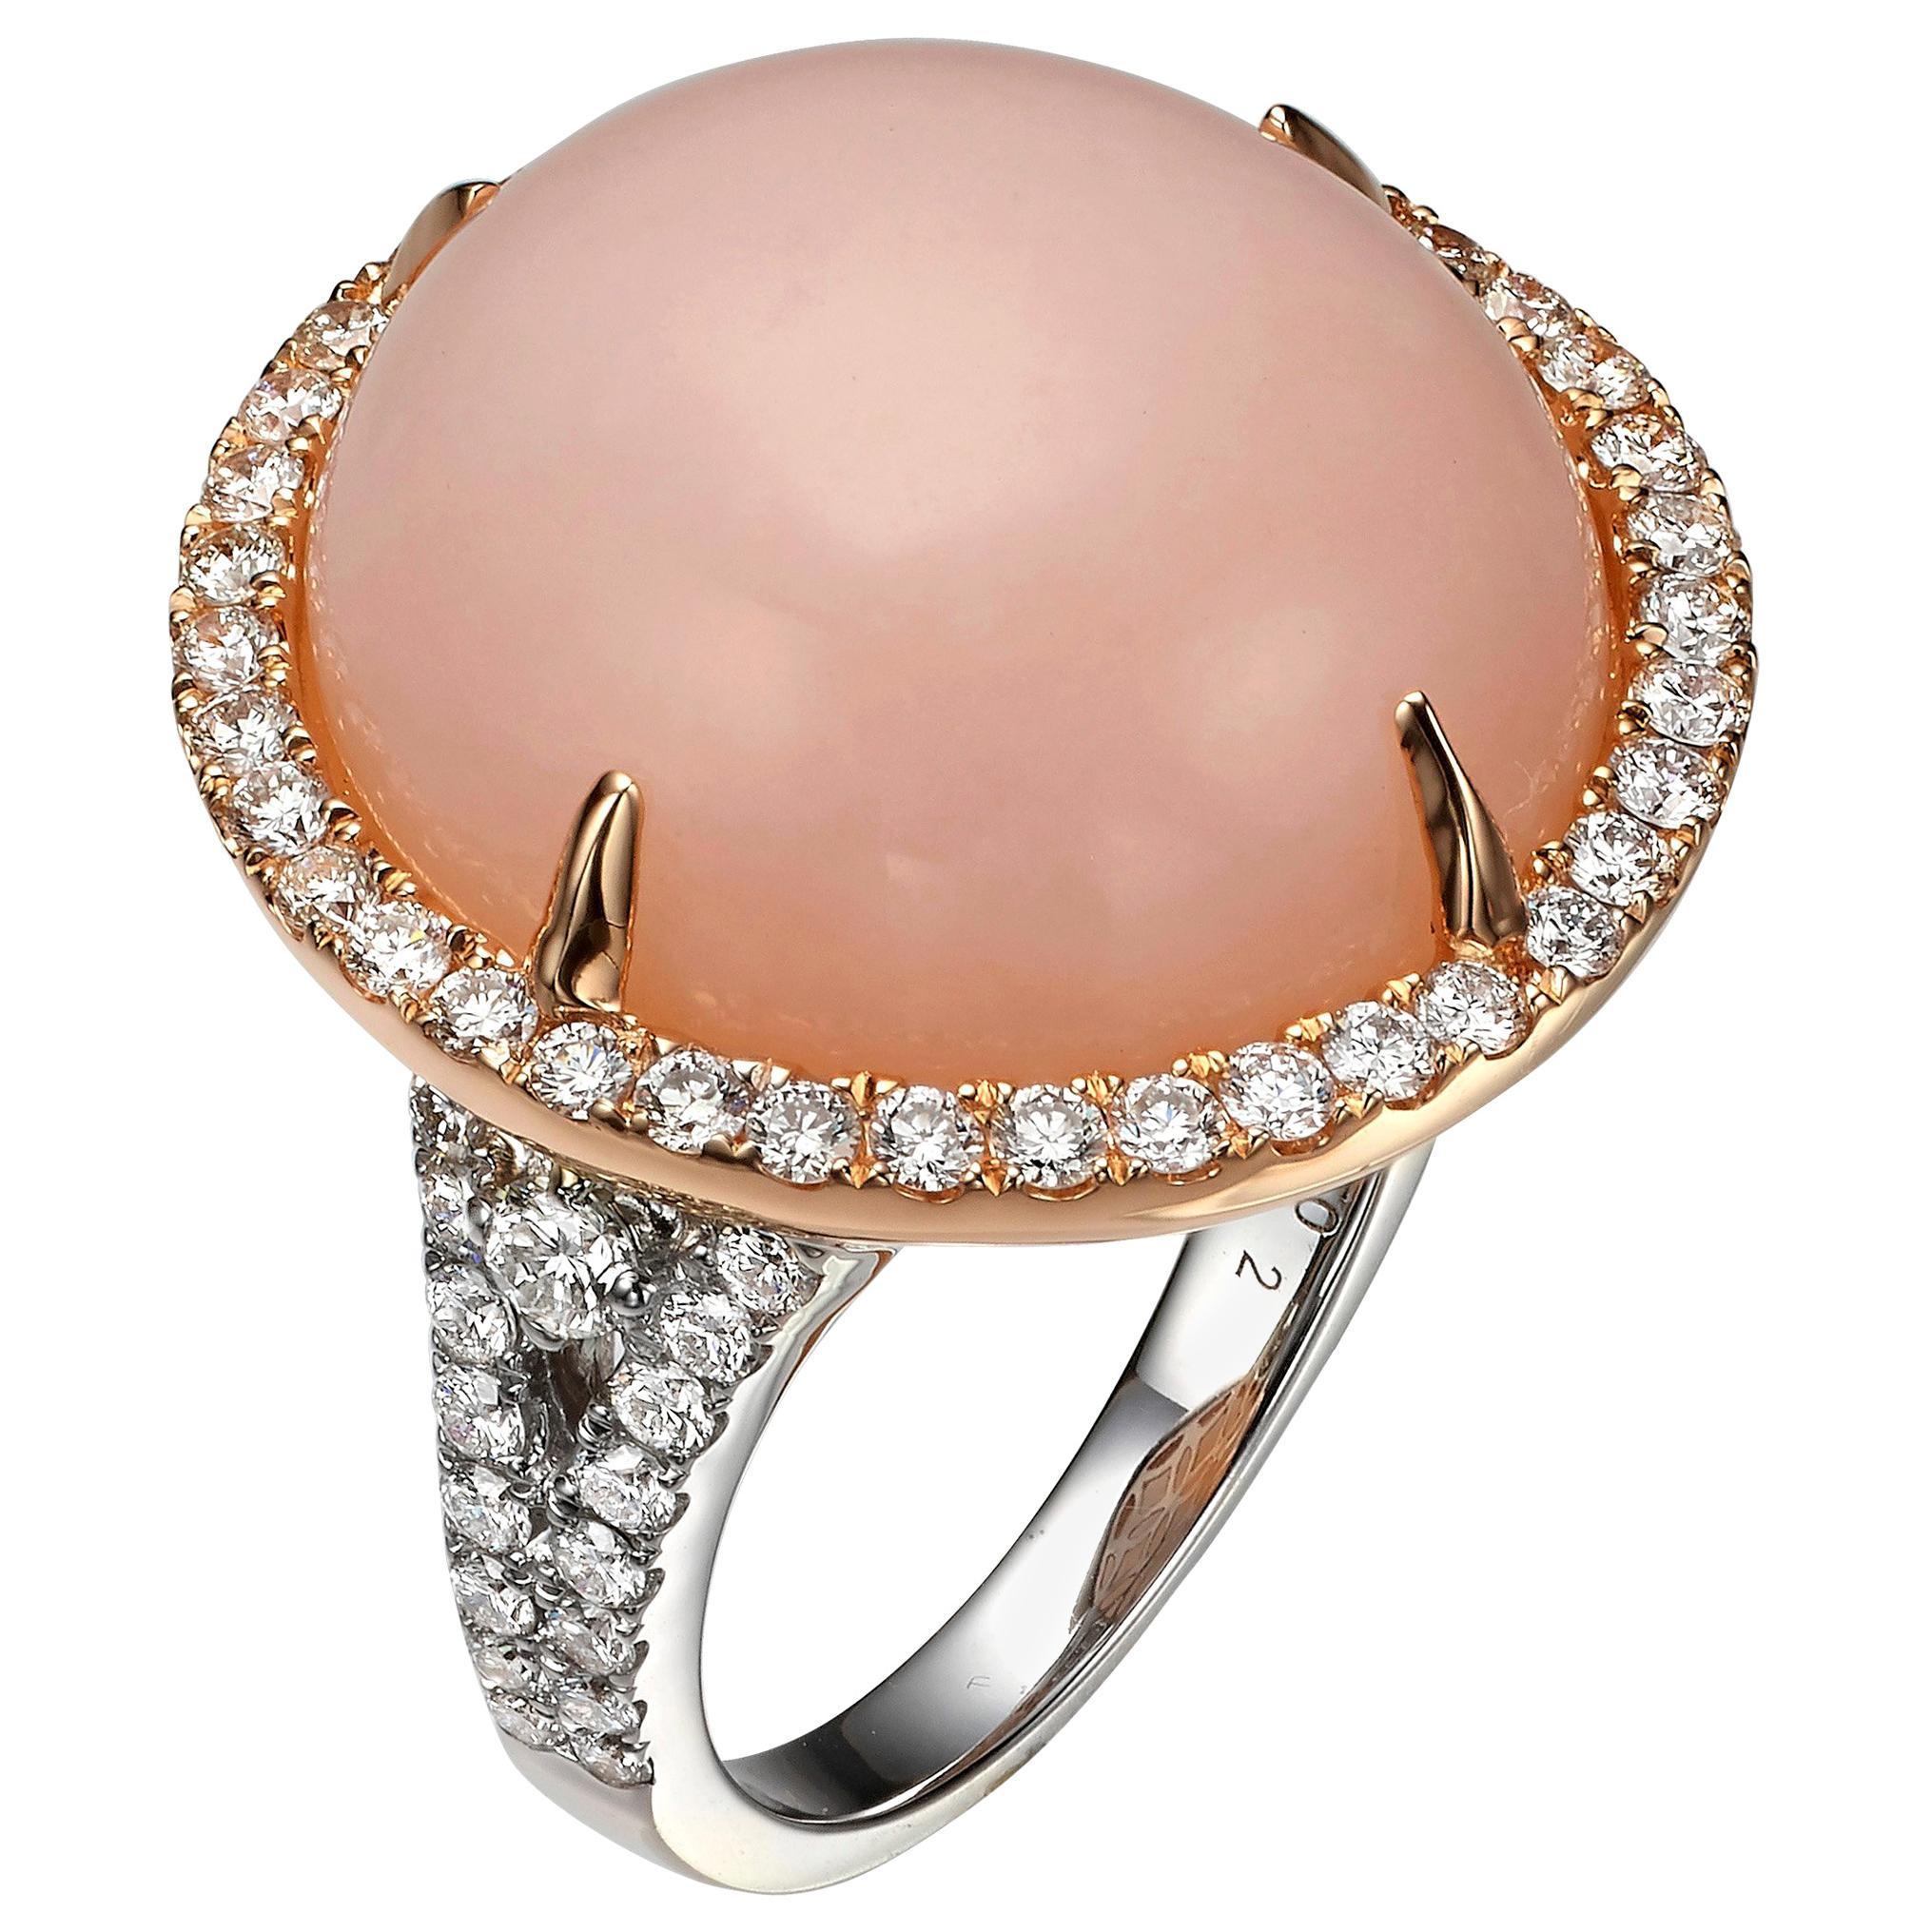 15.03 Carat Pink Opal and Diamond 18 Karat Rose and White Gold Cocktail Ring